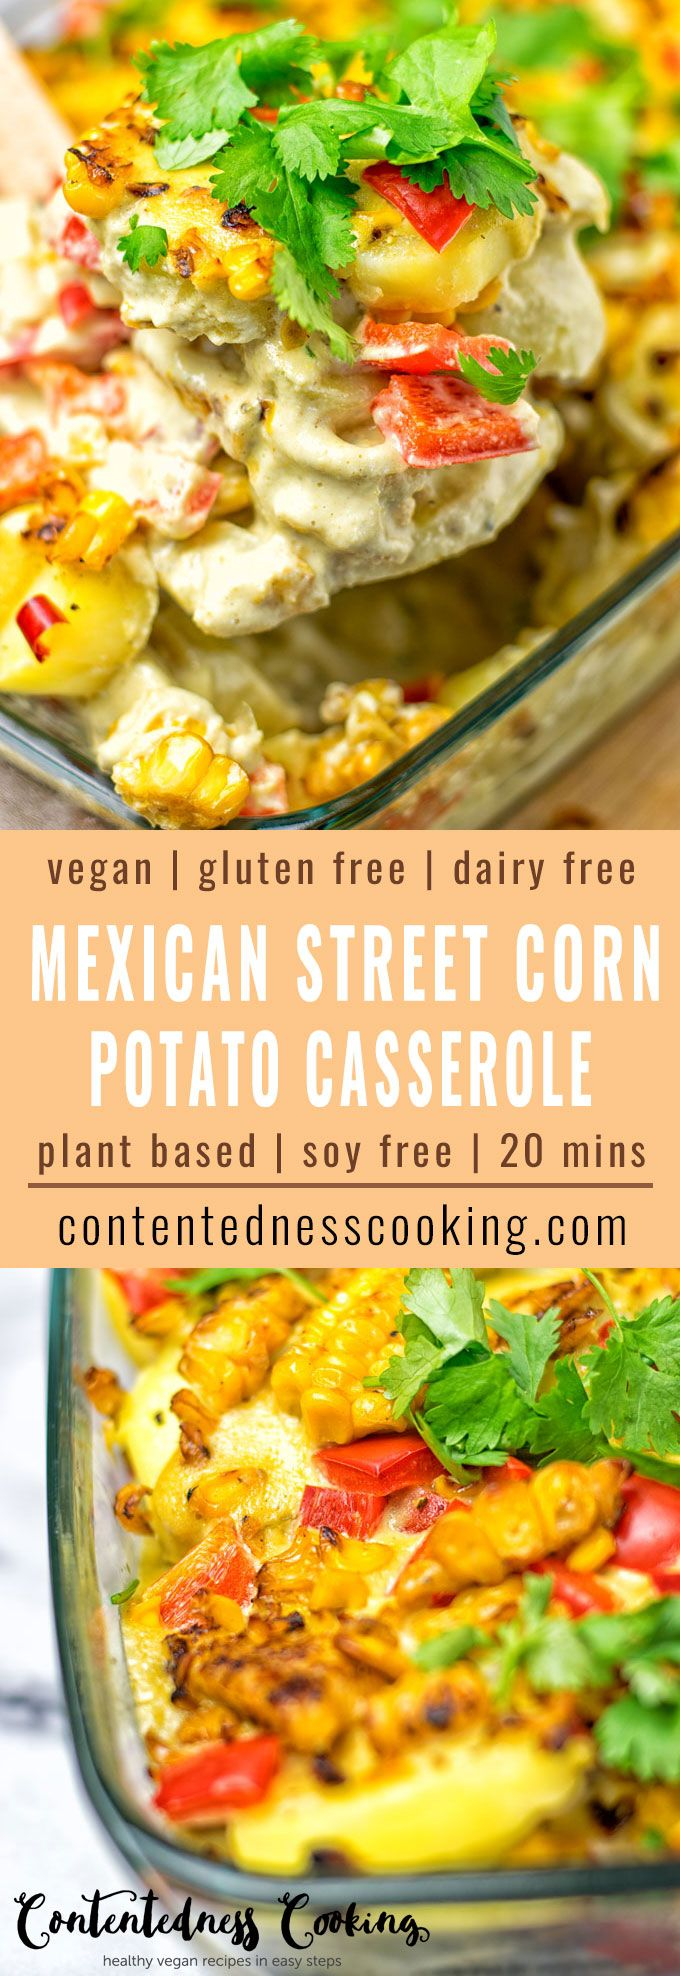 Mexican Street Corn Potato Casserole